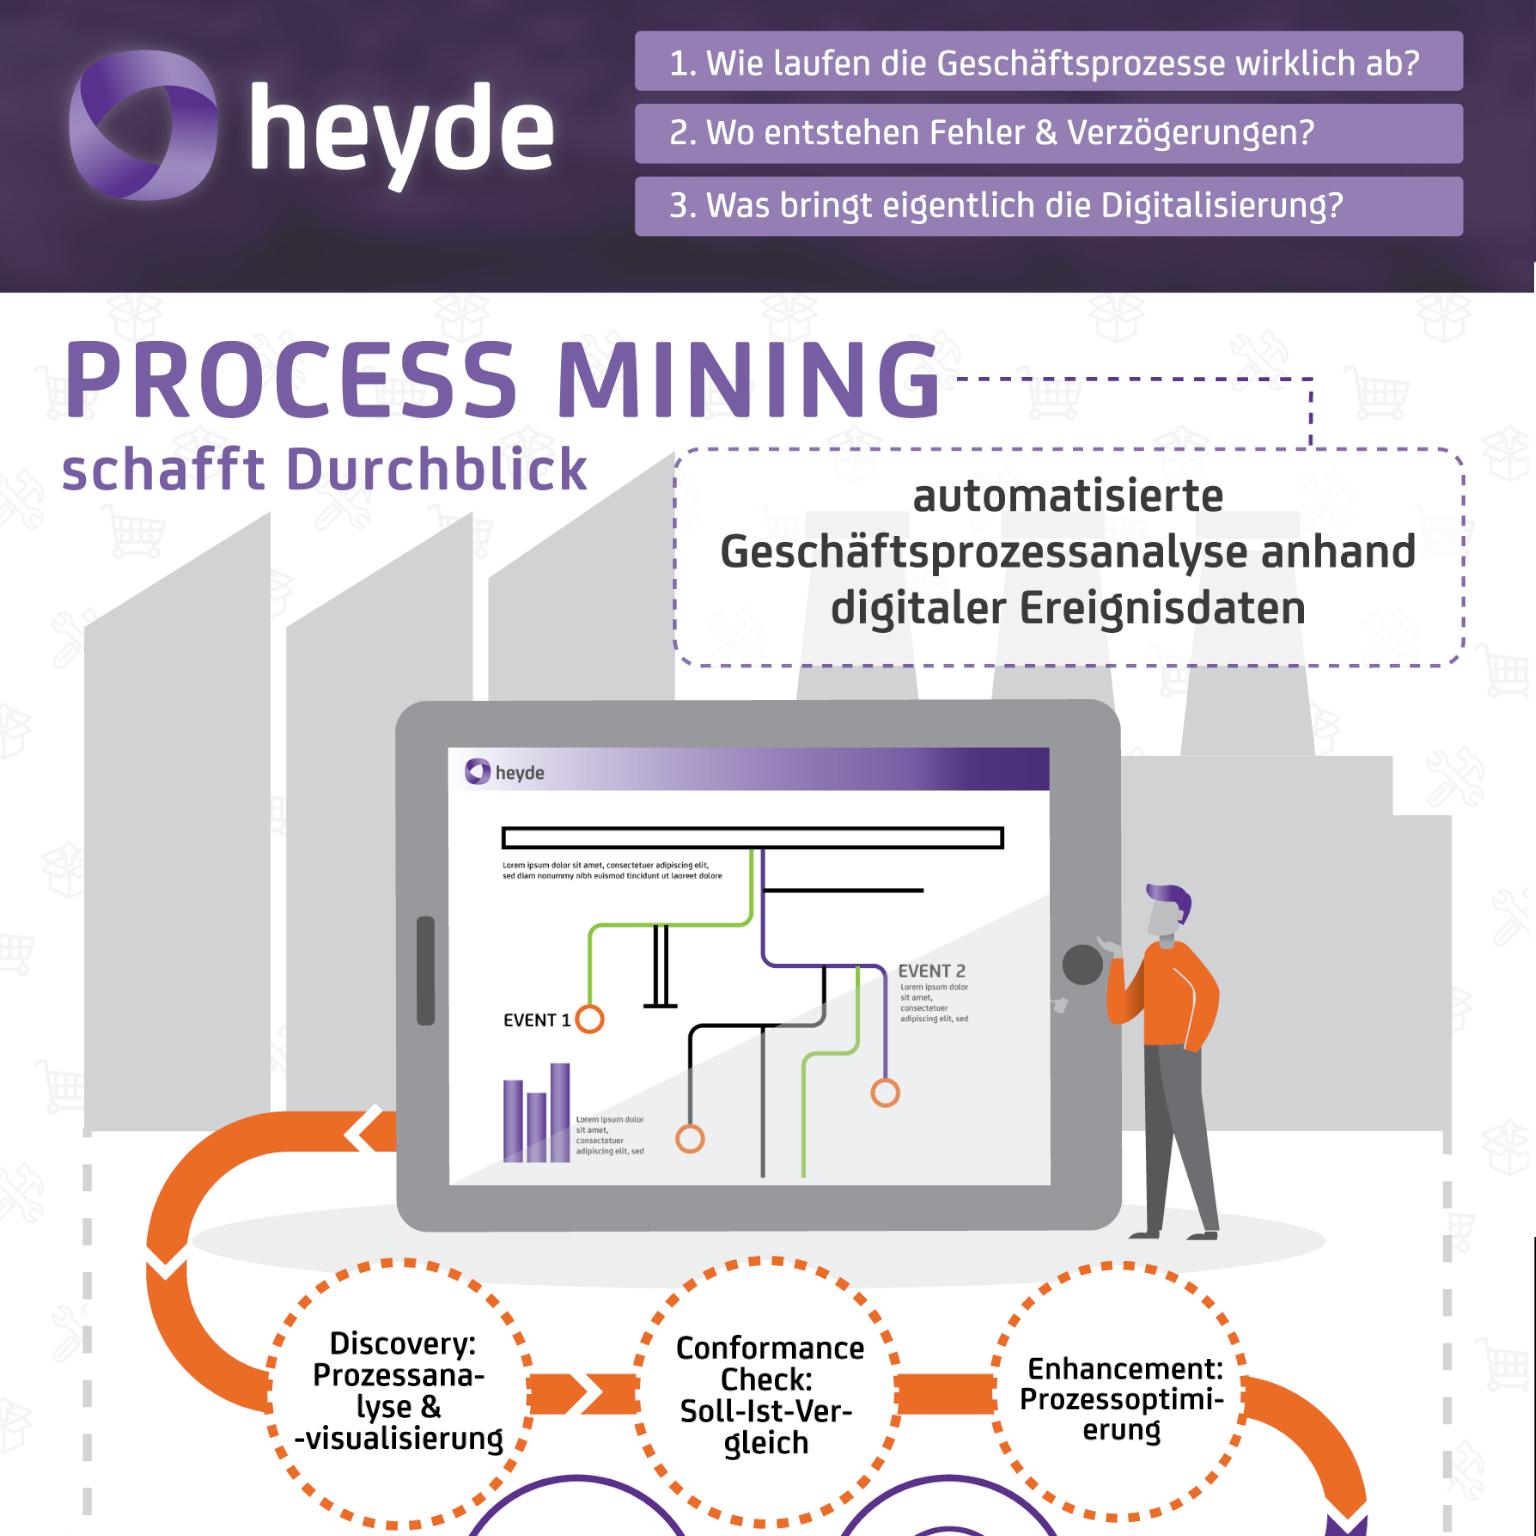 Process-Mining-Infographic-vorschau-sq